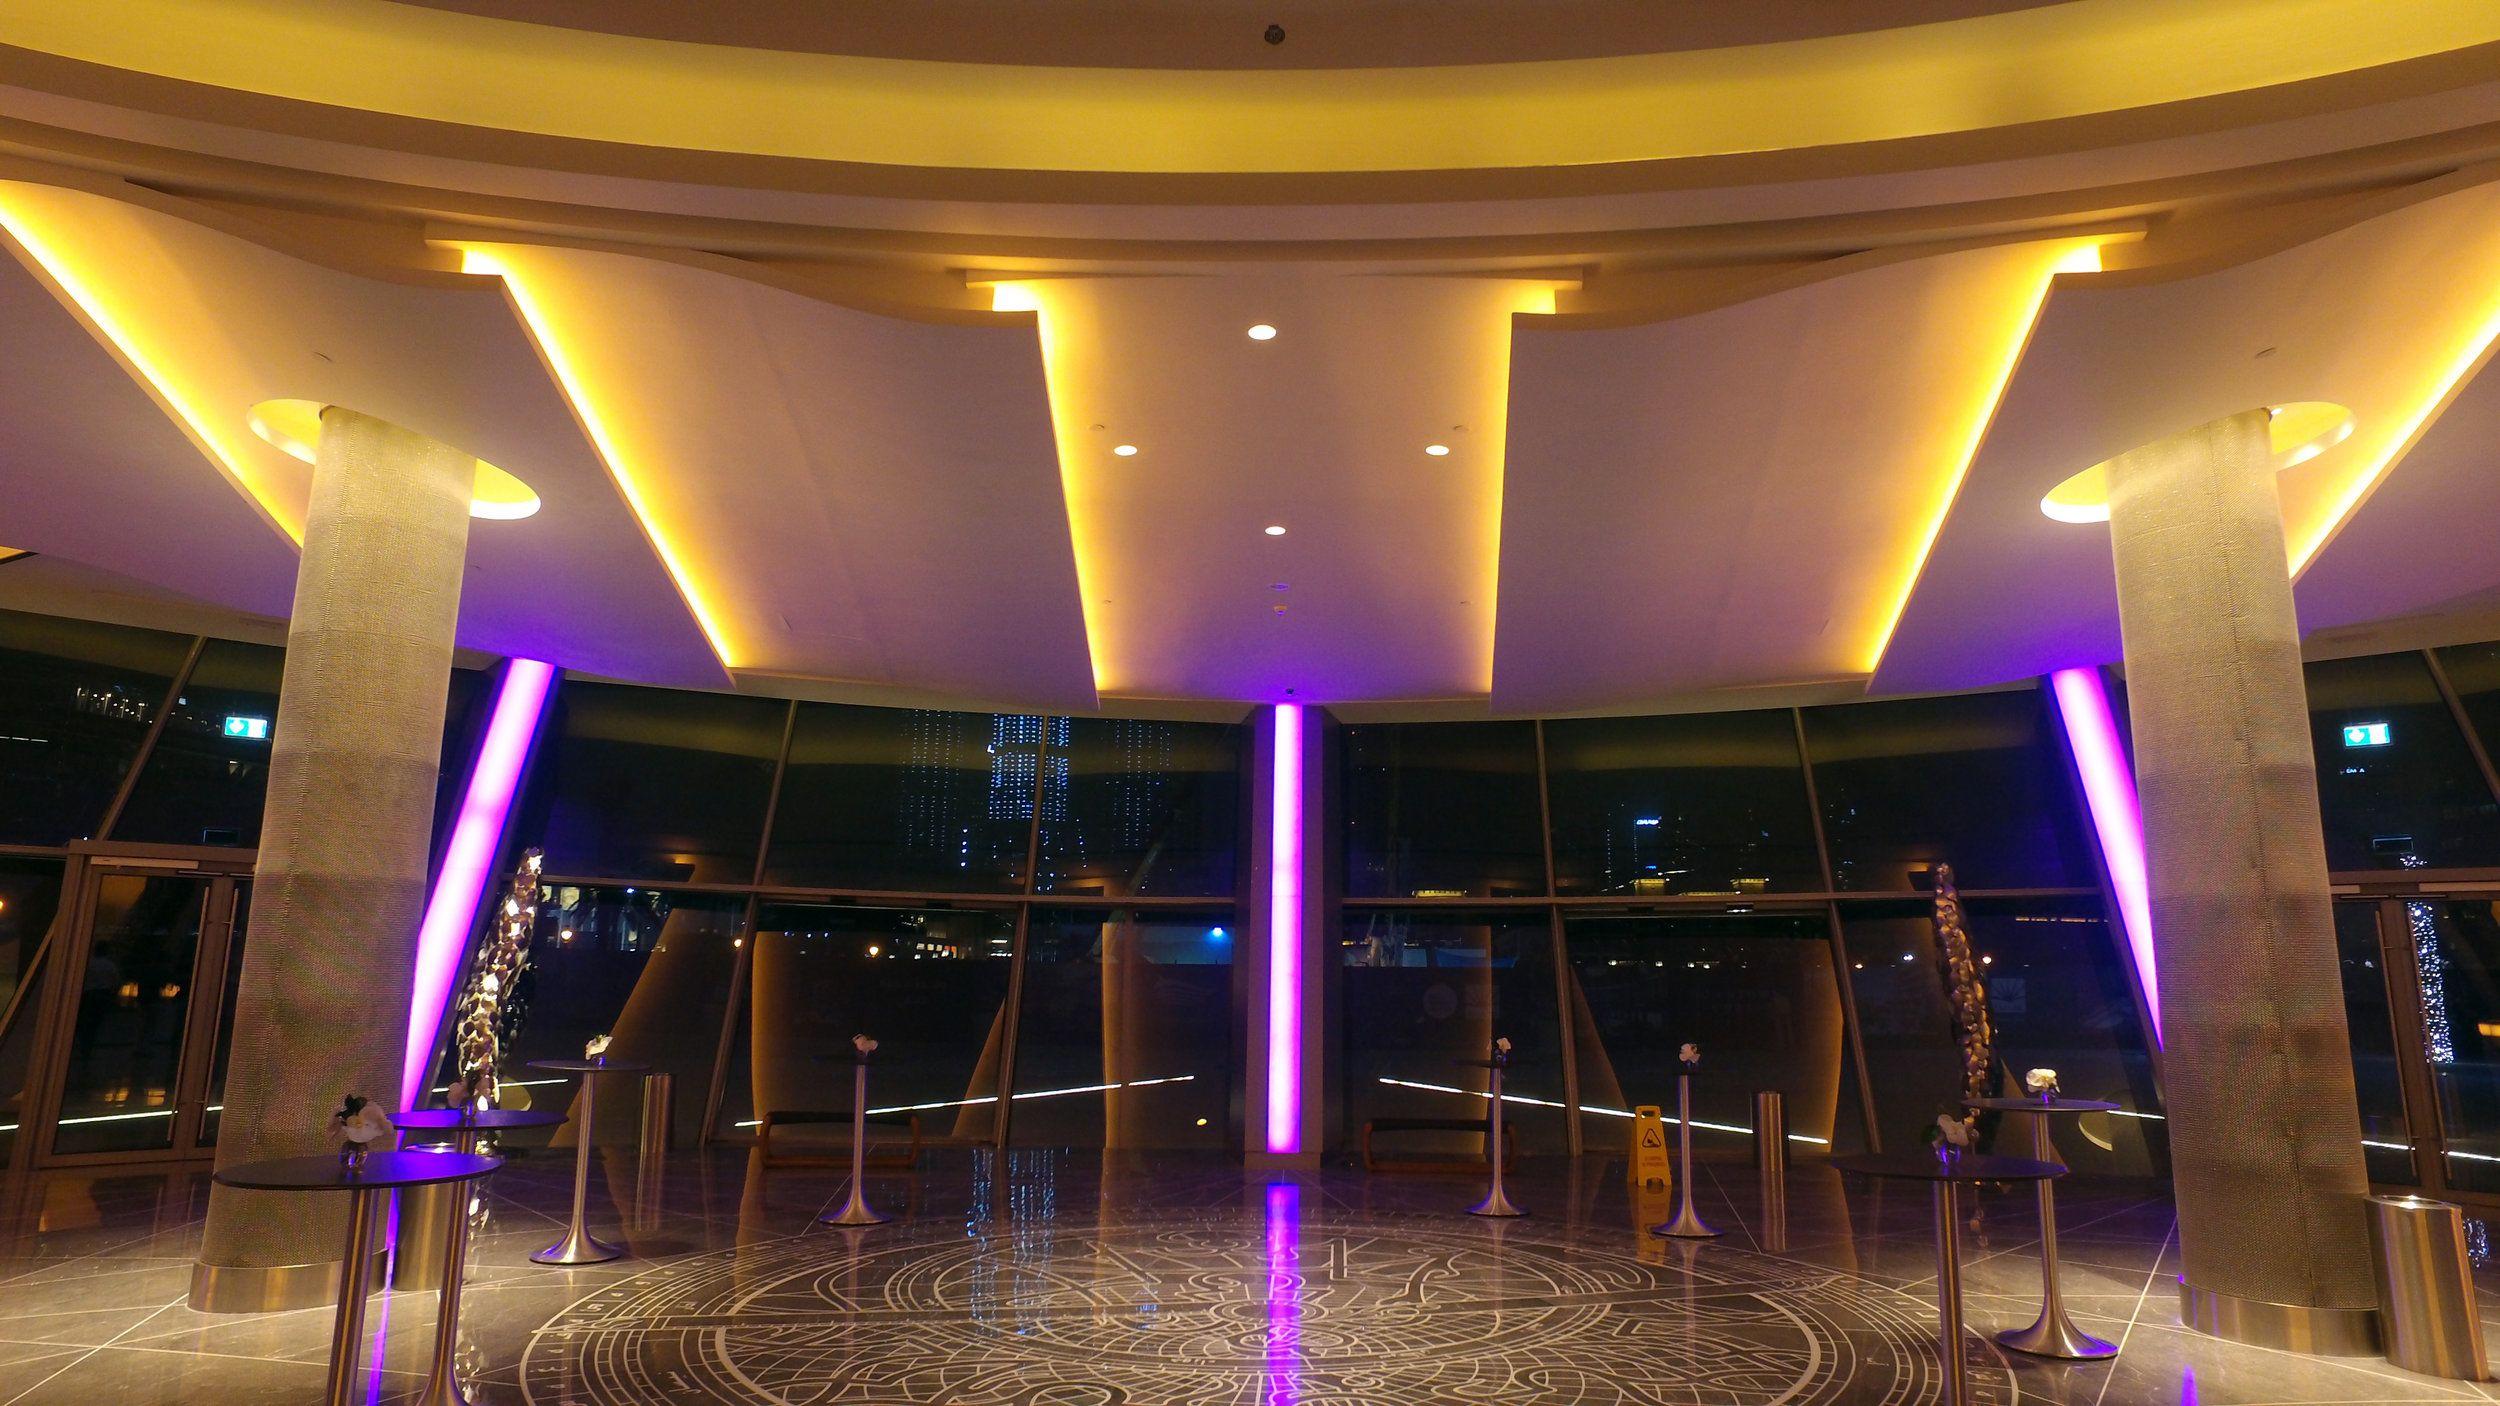 Dubai opera lighting design: neolight global dubai opera